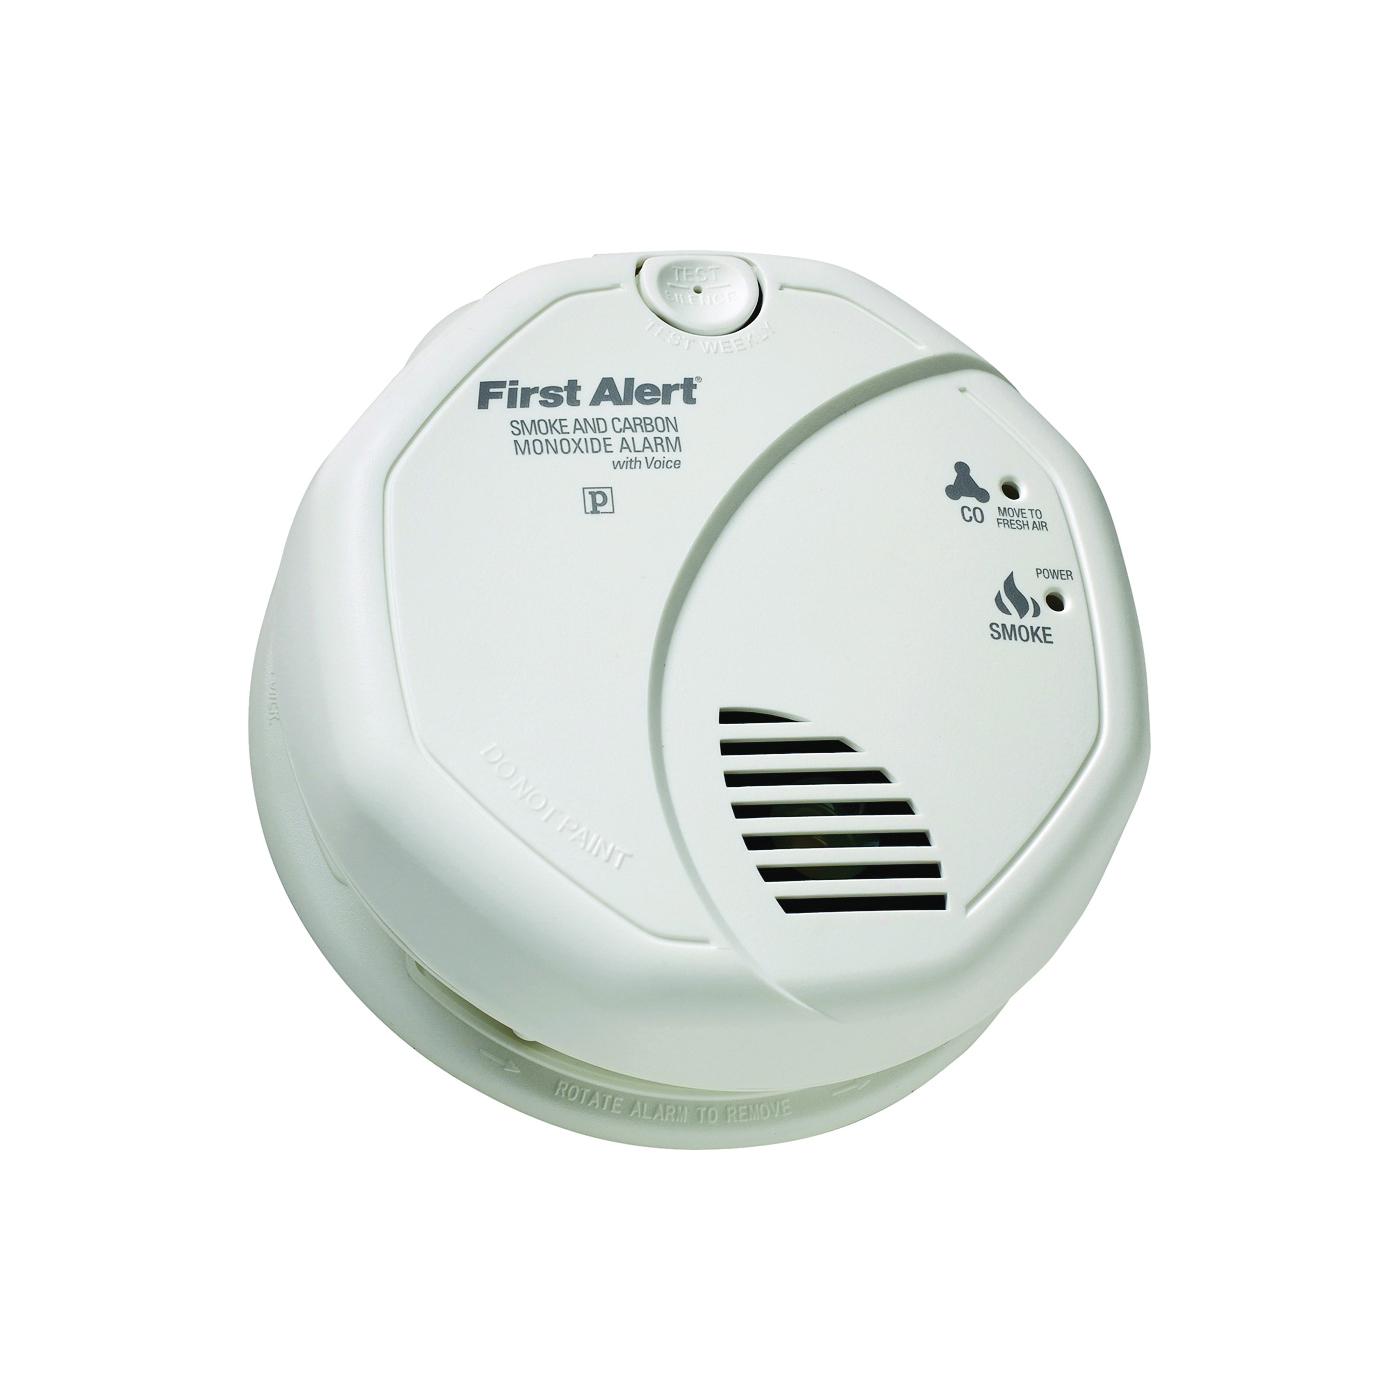 Picture of FIRST ALERT SC7010BV Carbon Monoxide Alarm, 10 ft, 85 dB, Alarm: Audible, Electrochemical, Photoelectric Sensor